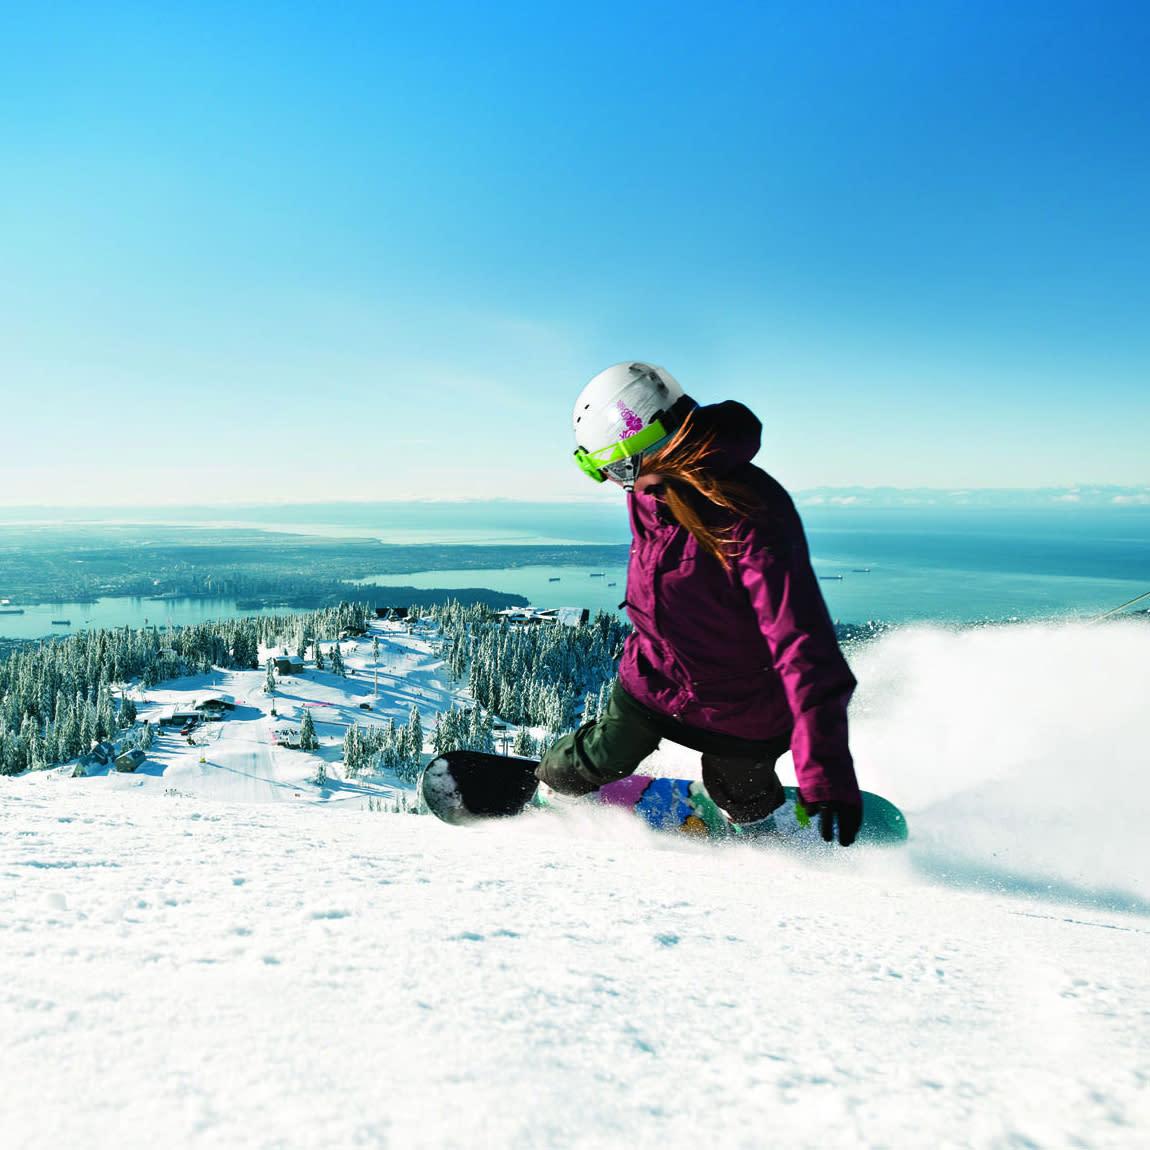 Grouse Mountain snowboarding